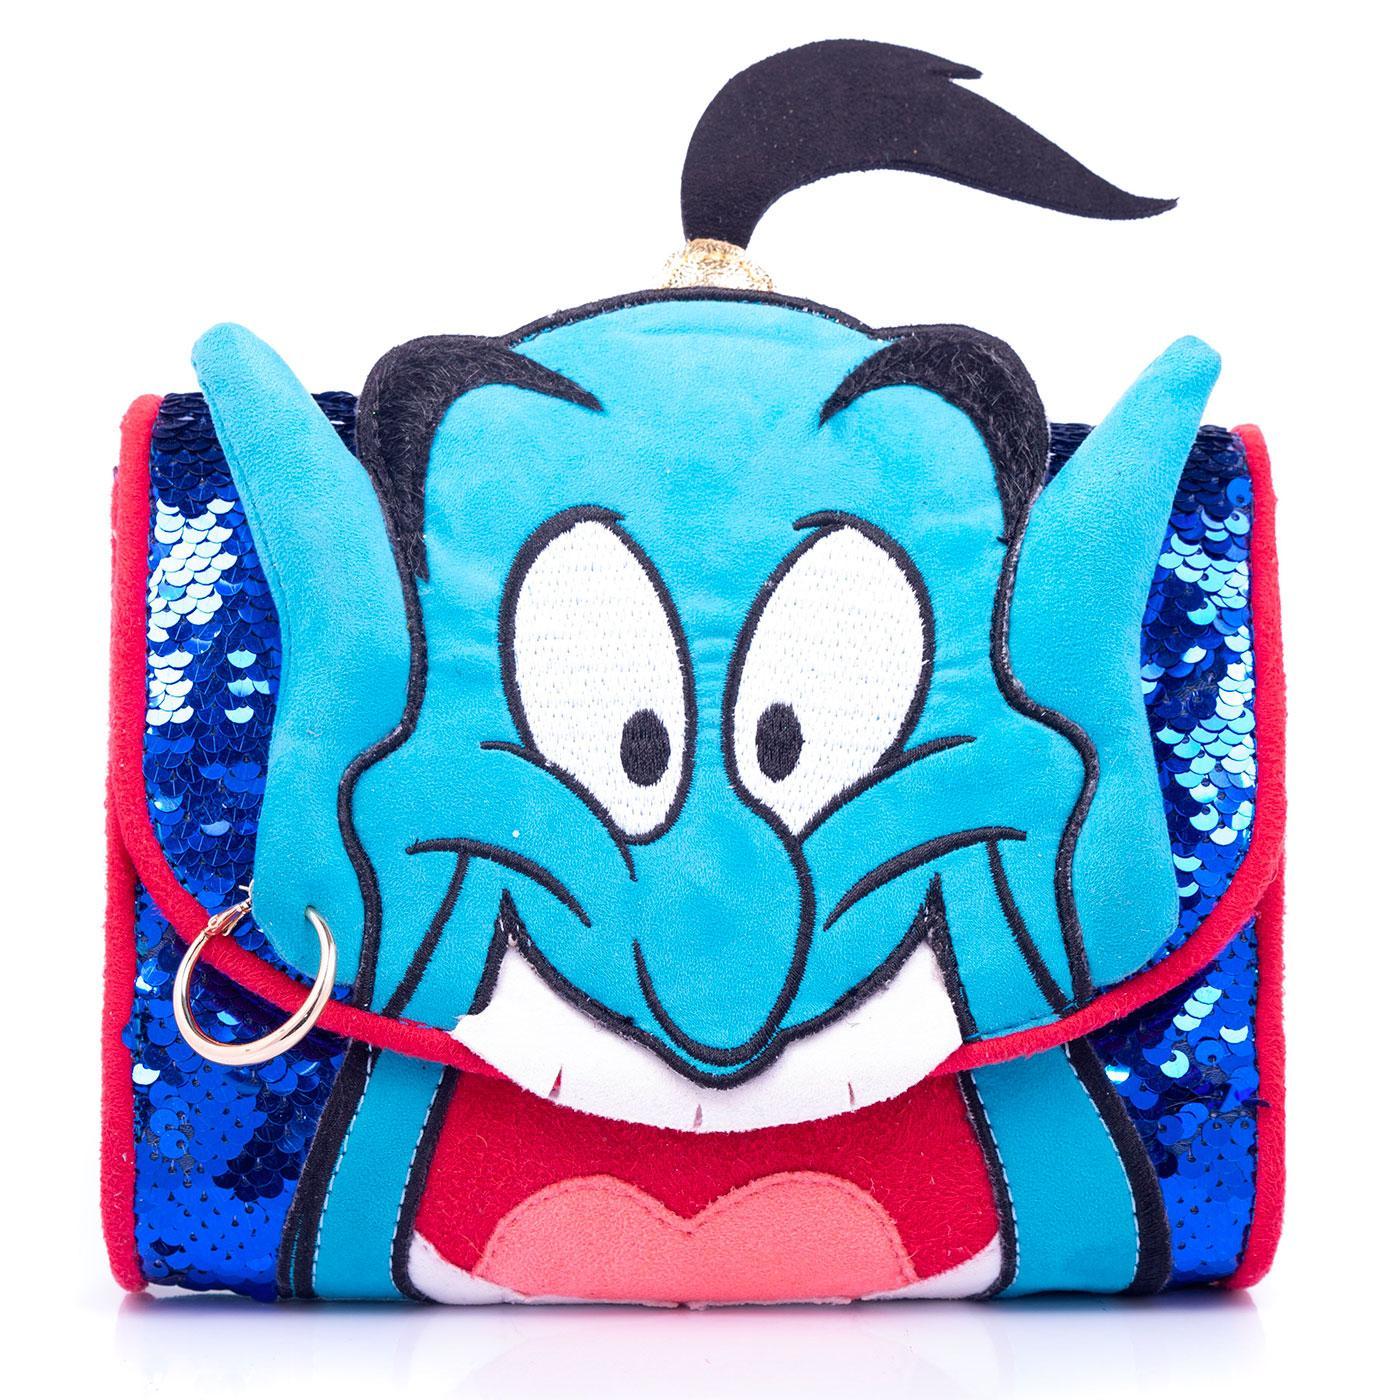 At Your Service! IRREGULAR CHOICE Disney Genie Bag